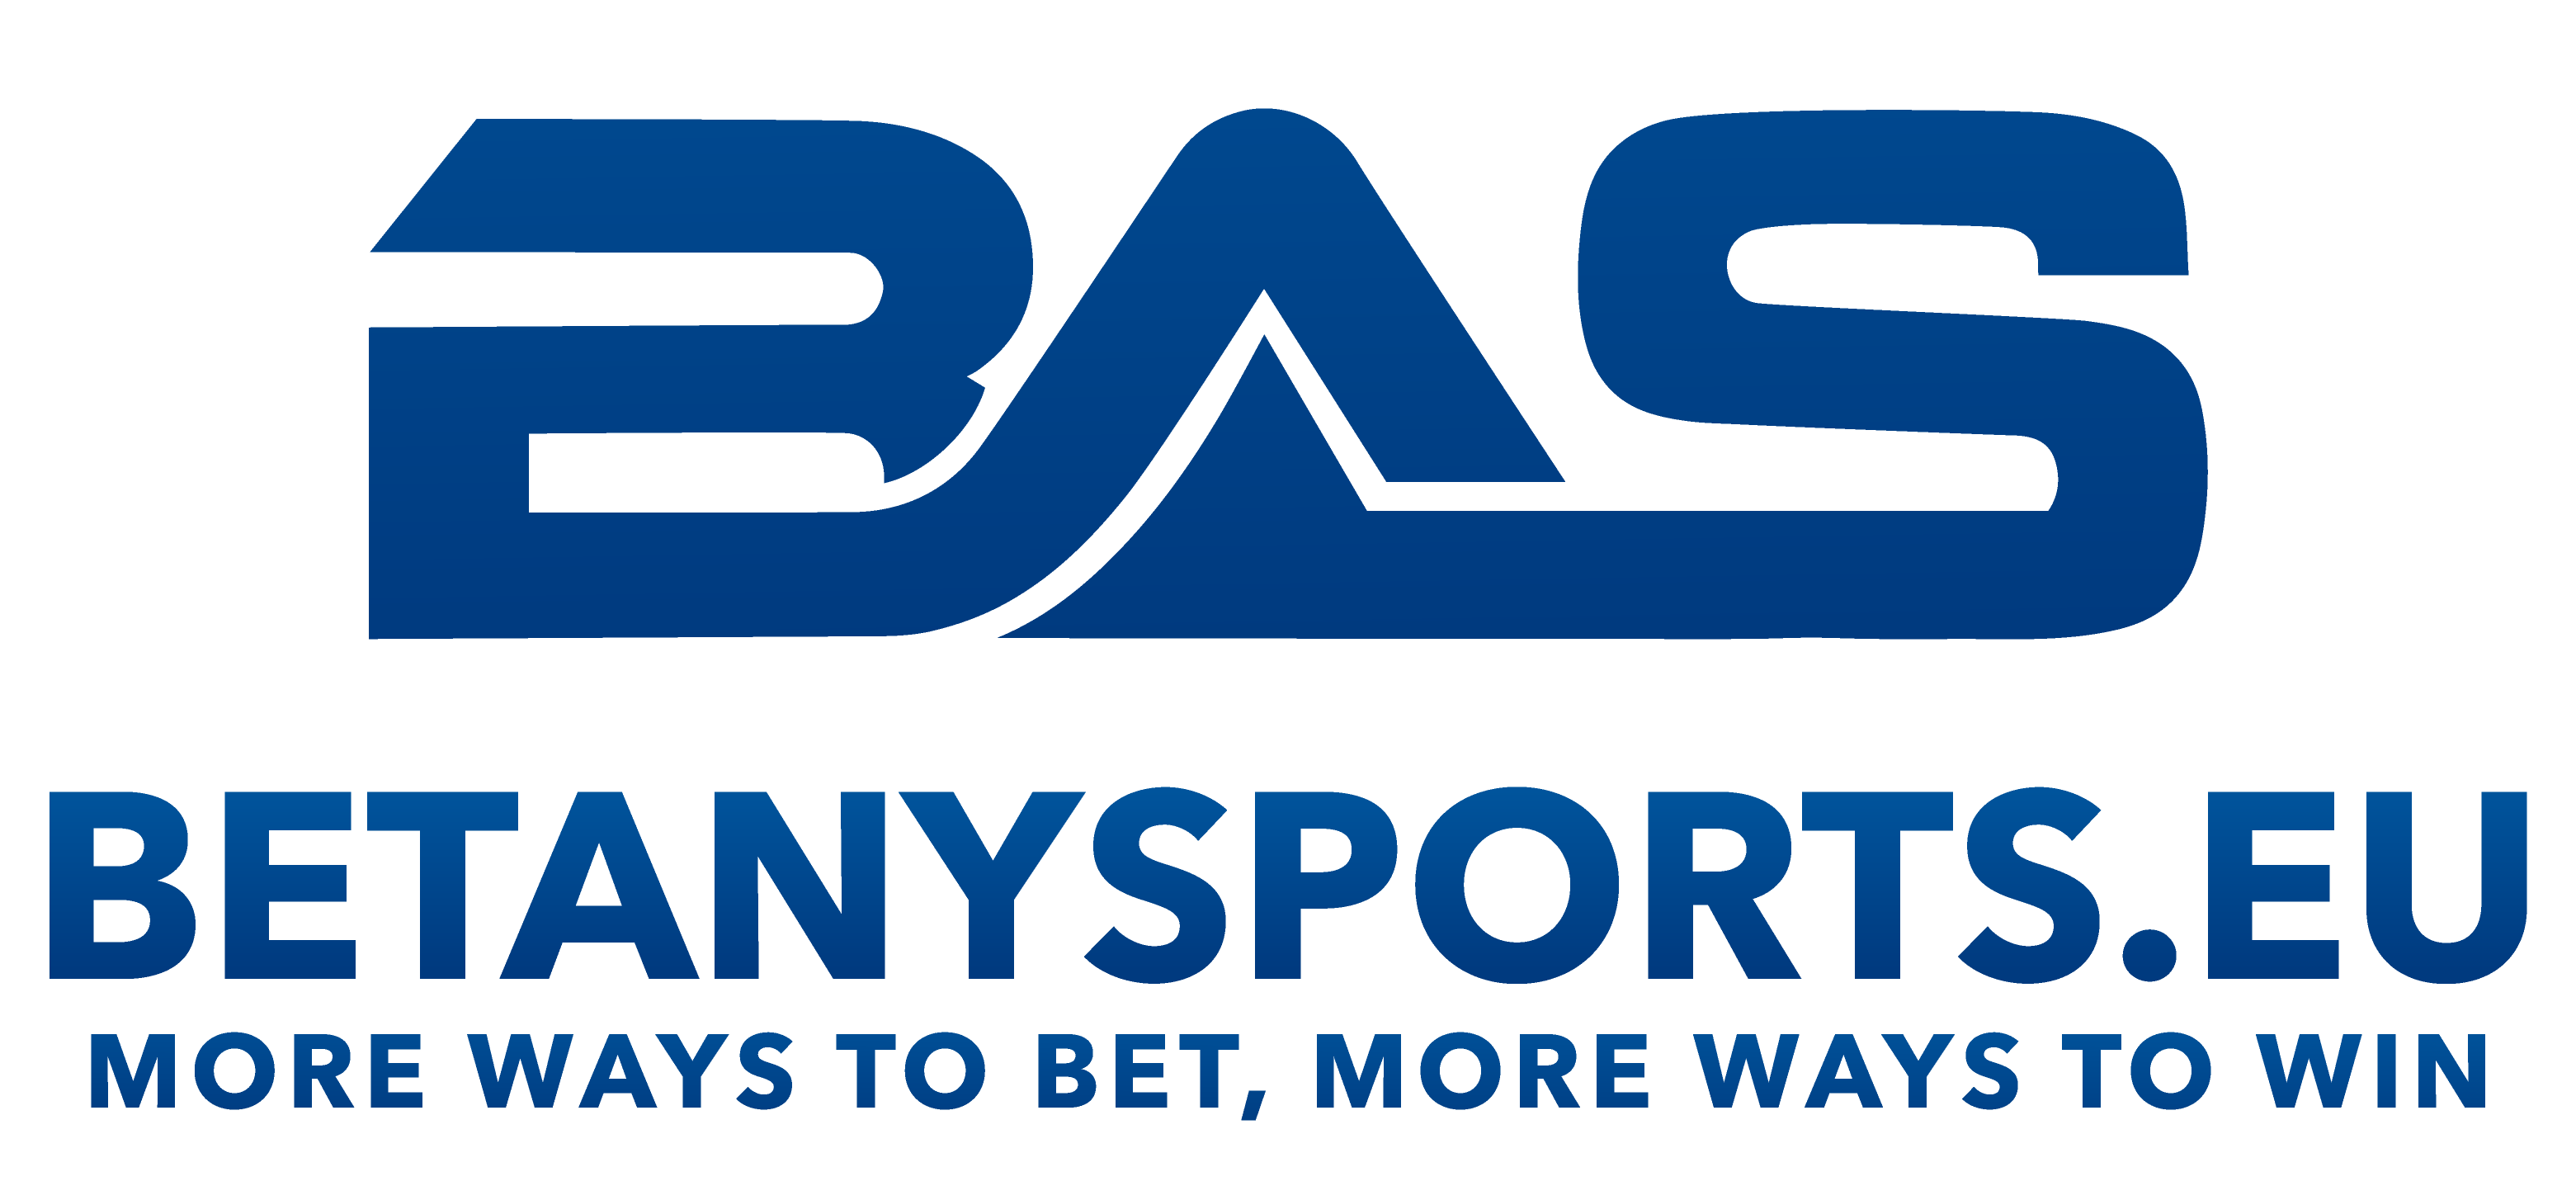 #2 BetAnySports Sportsbook